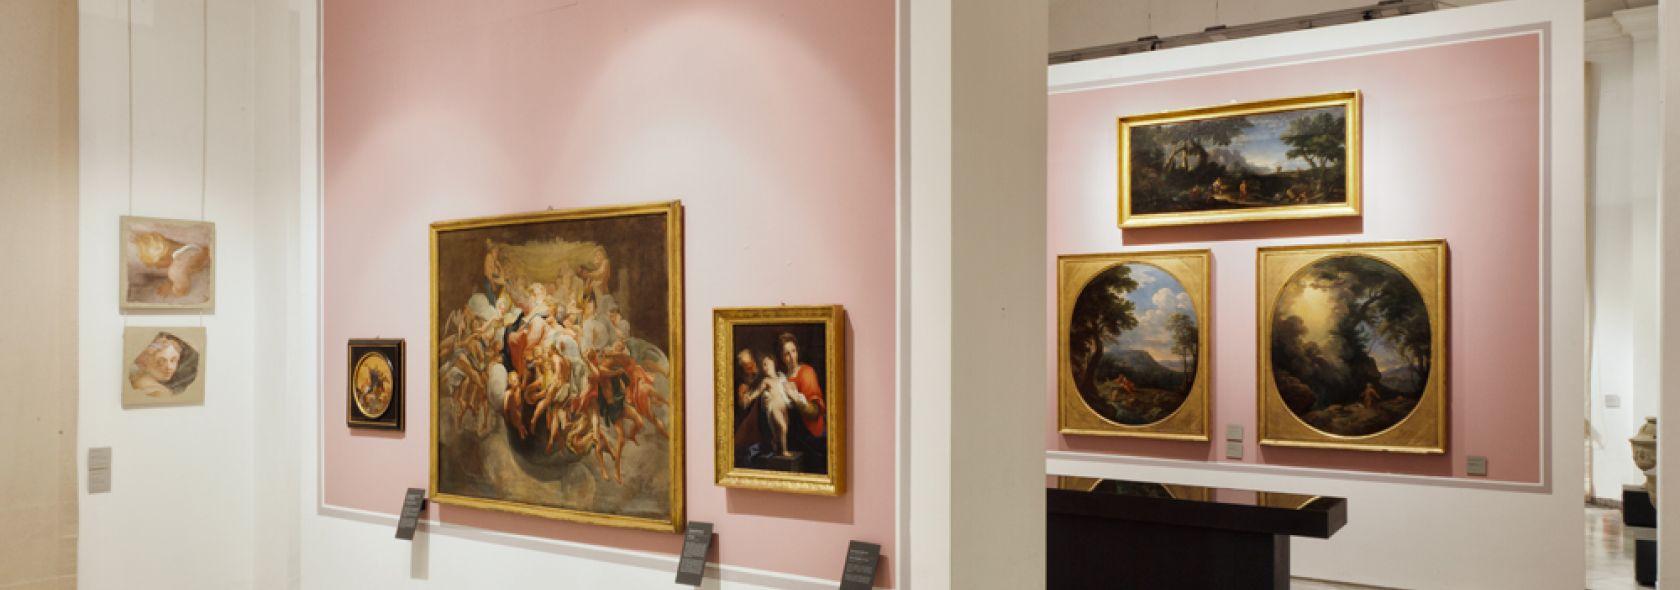 Accademia Ligustica - Sala XVII - XVIII secolo -  foto © Francesco Manias